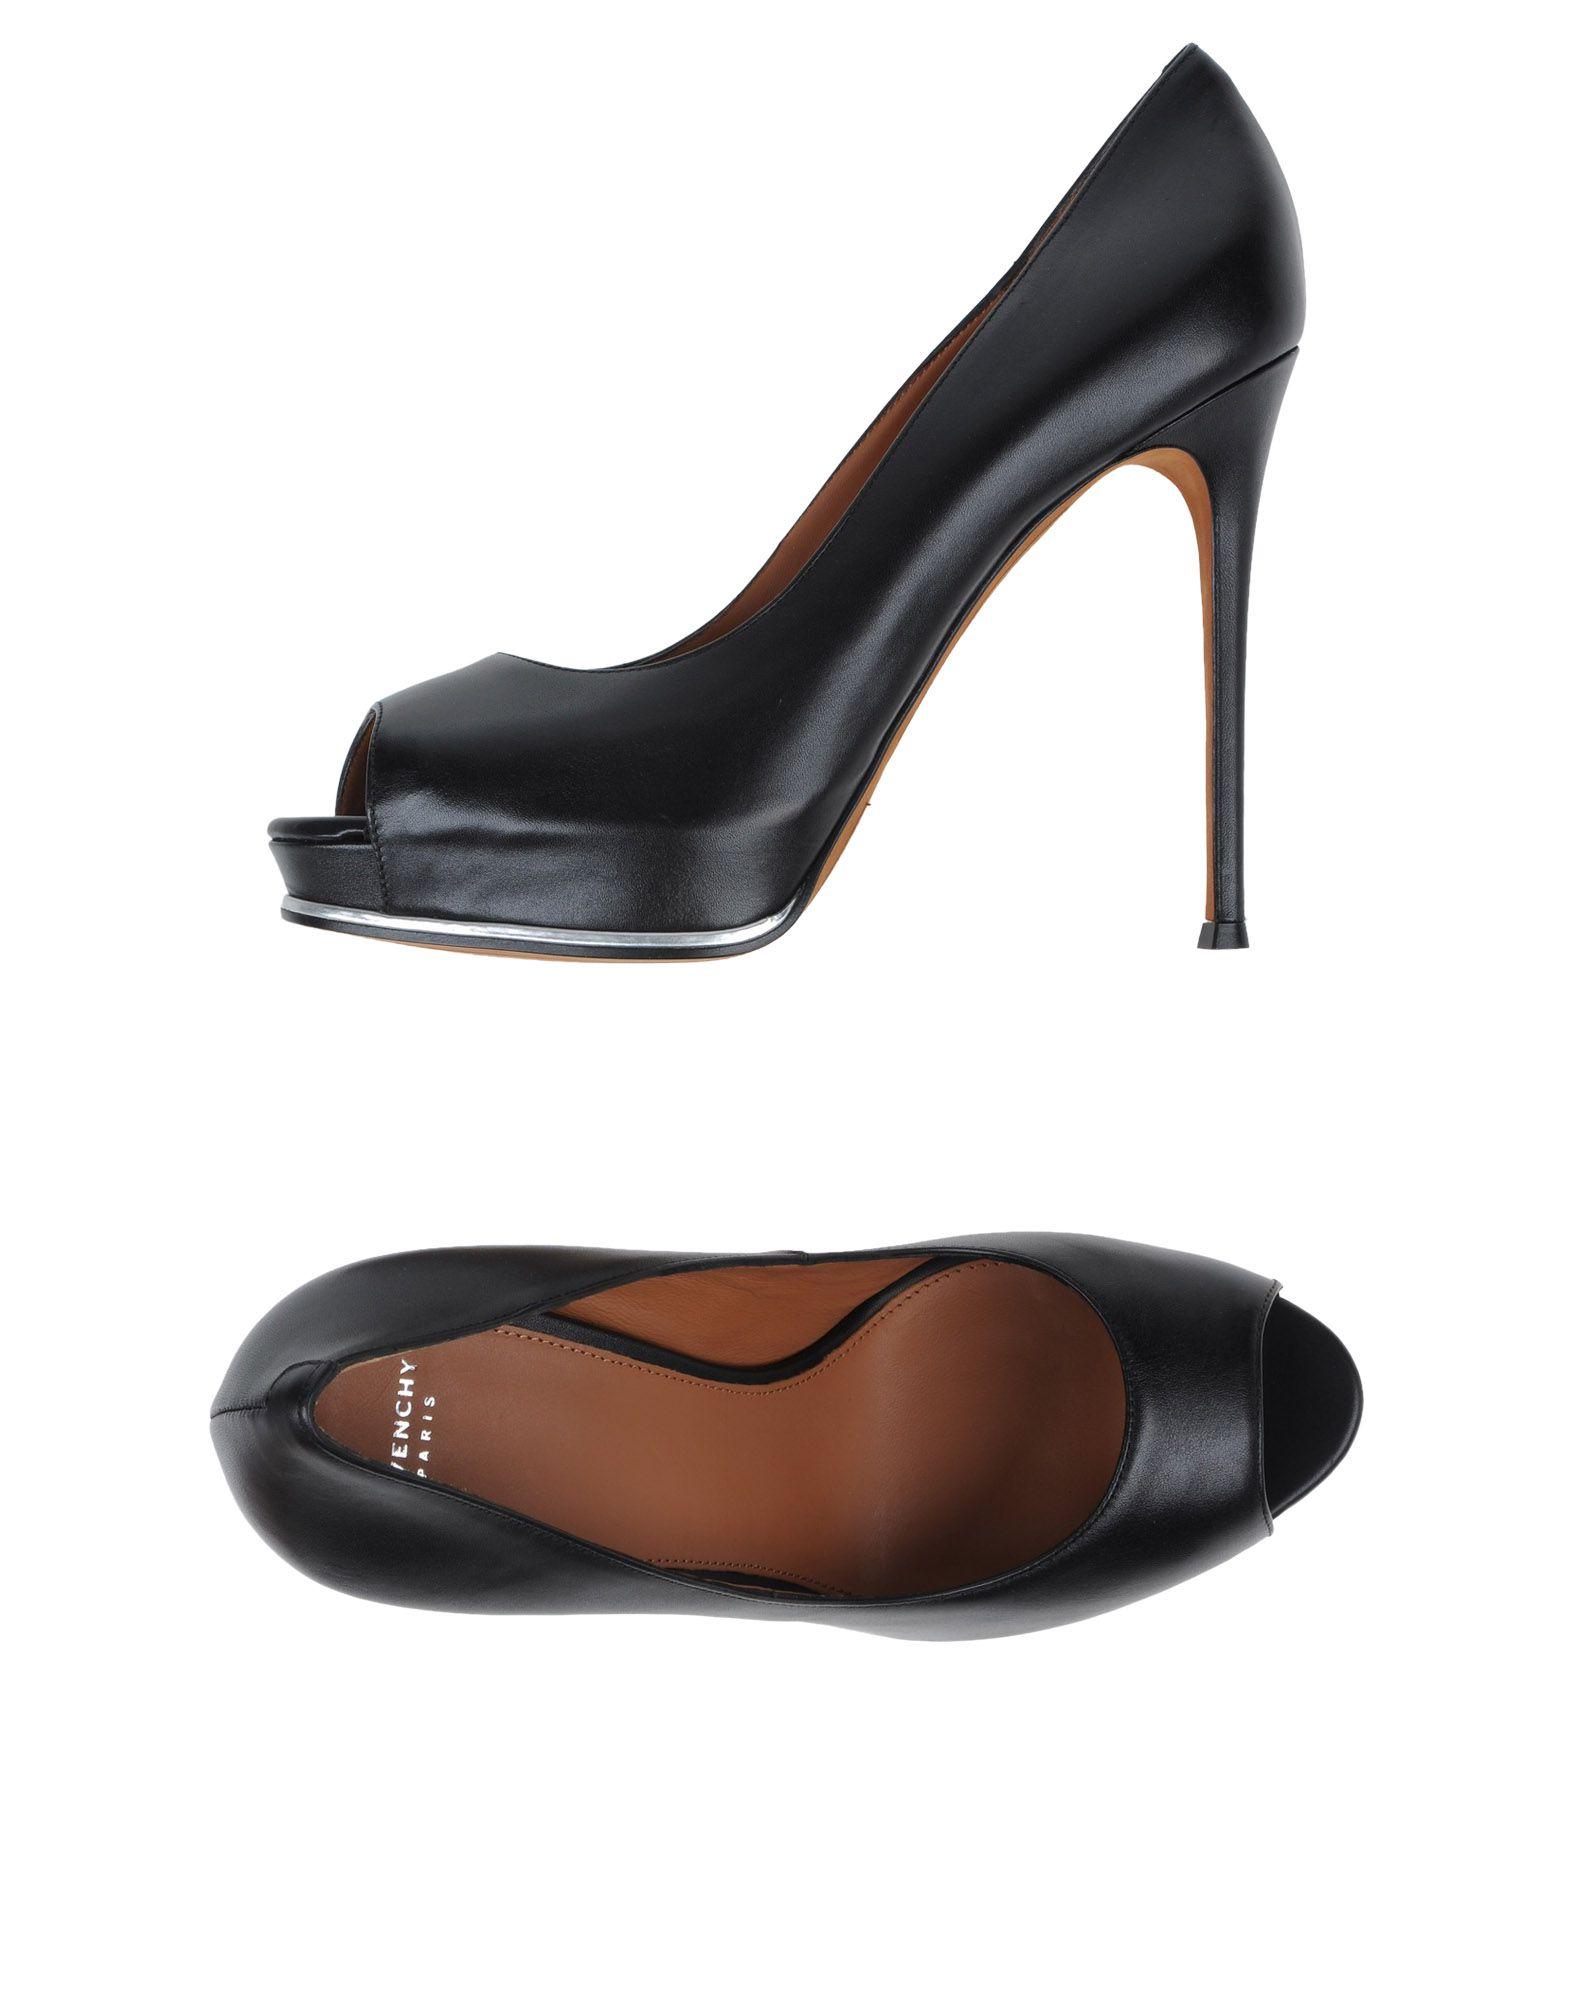 Escarpins Givenchy Femme - Escarpins Givenchy sur